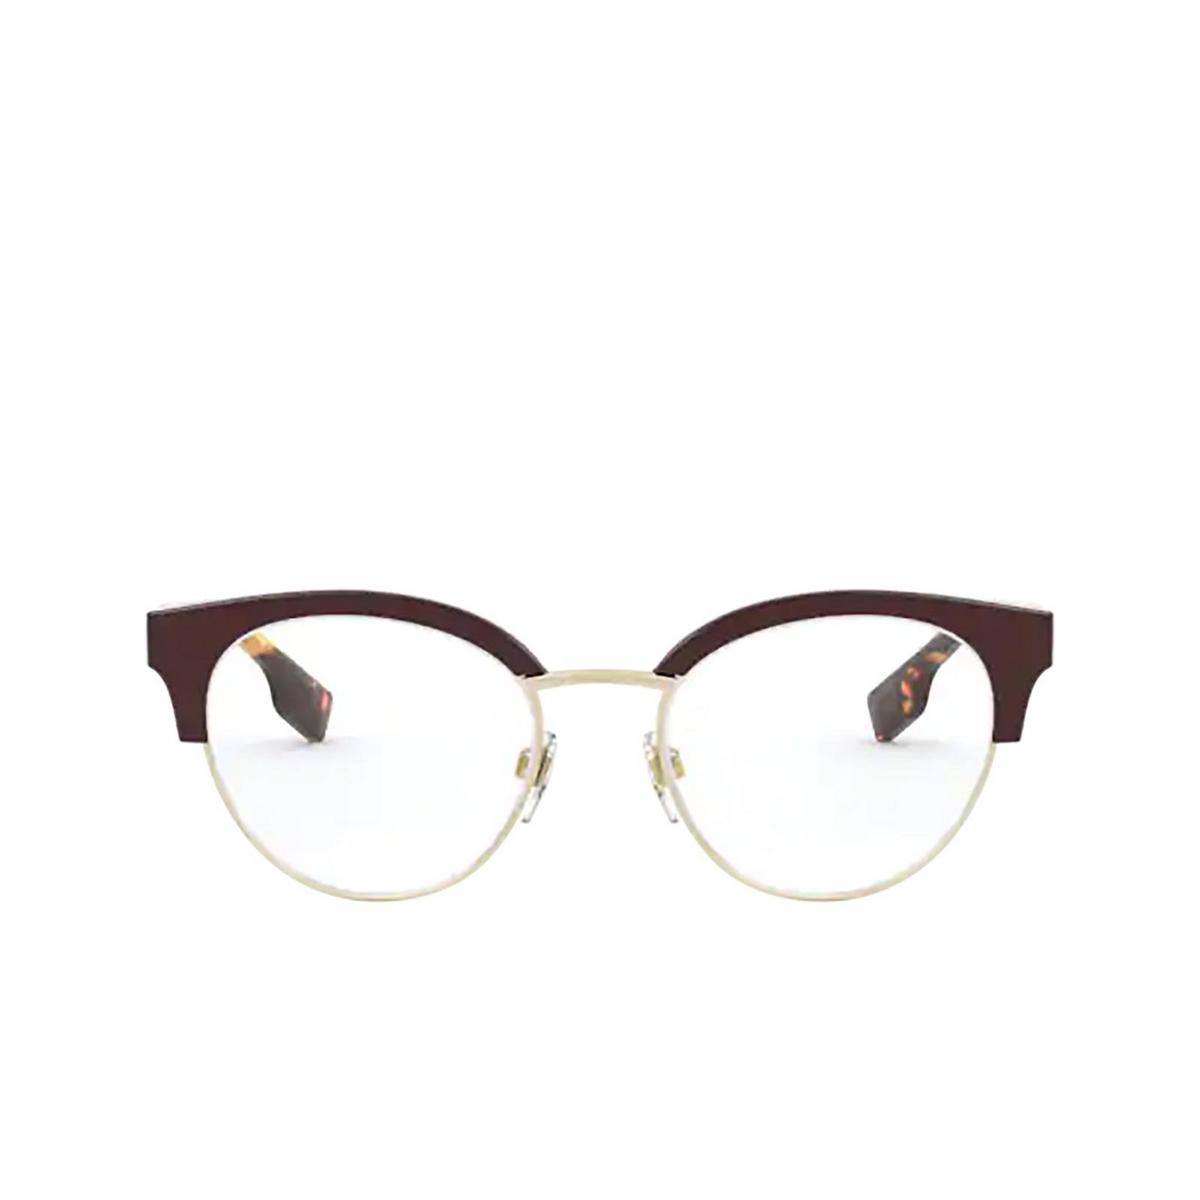 Burberry® Round Eyeglasses: Birch BE2316 color Bordeaux / Pale Gold 3869 - front view.